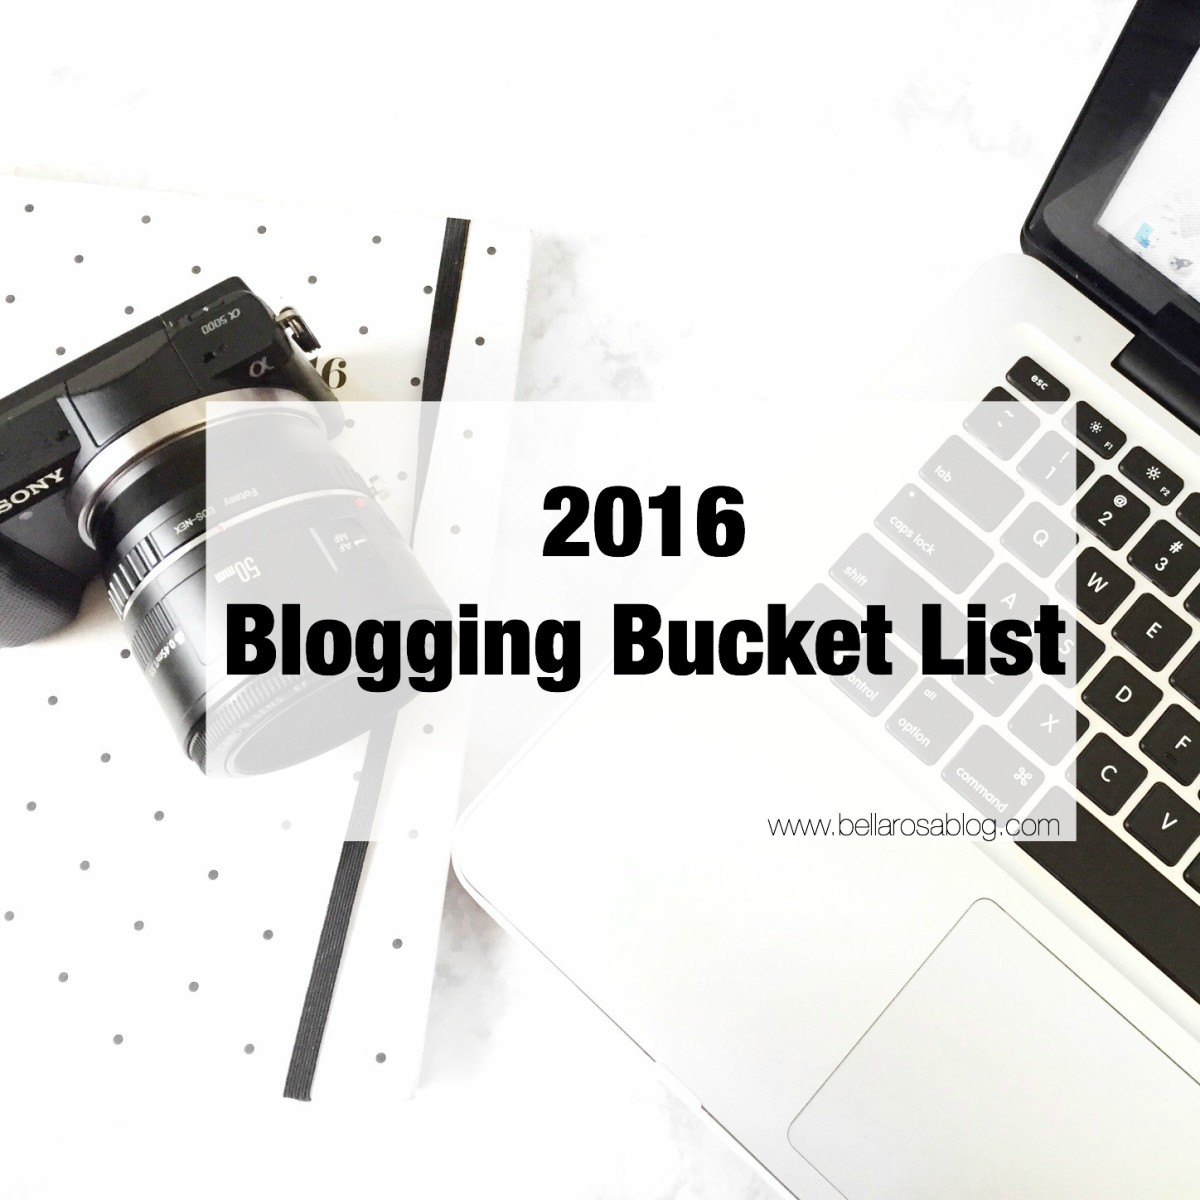 Blogging Bucket List | 2016